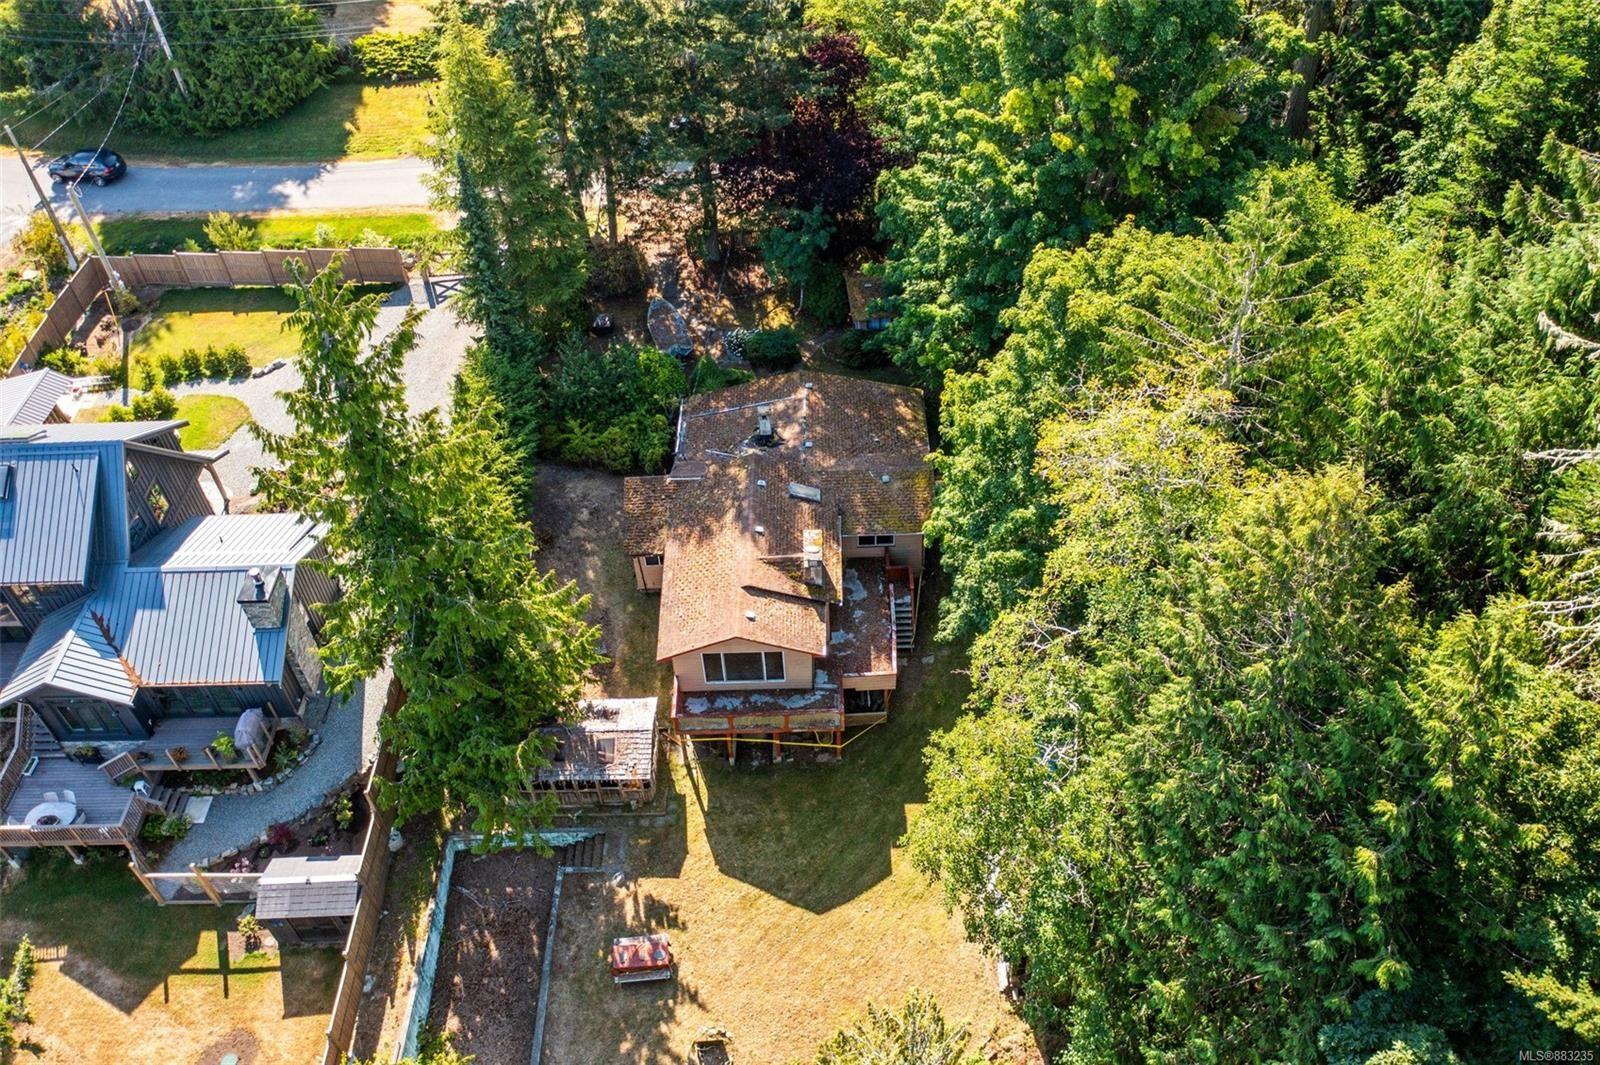 Photo 28: Photos: 6542 Thornett Rd in : Sk East Sooke House for sale (Sooke)  : MLS®# 883235